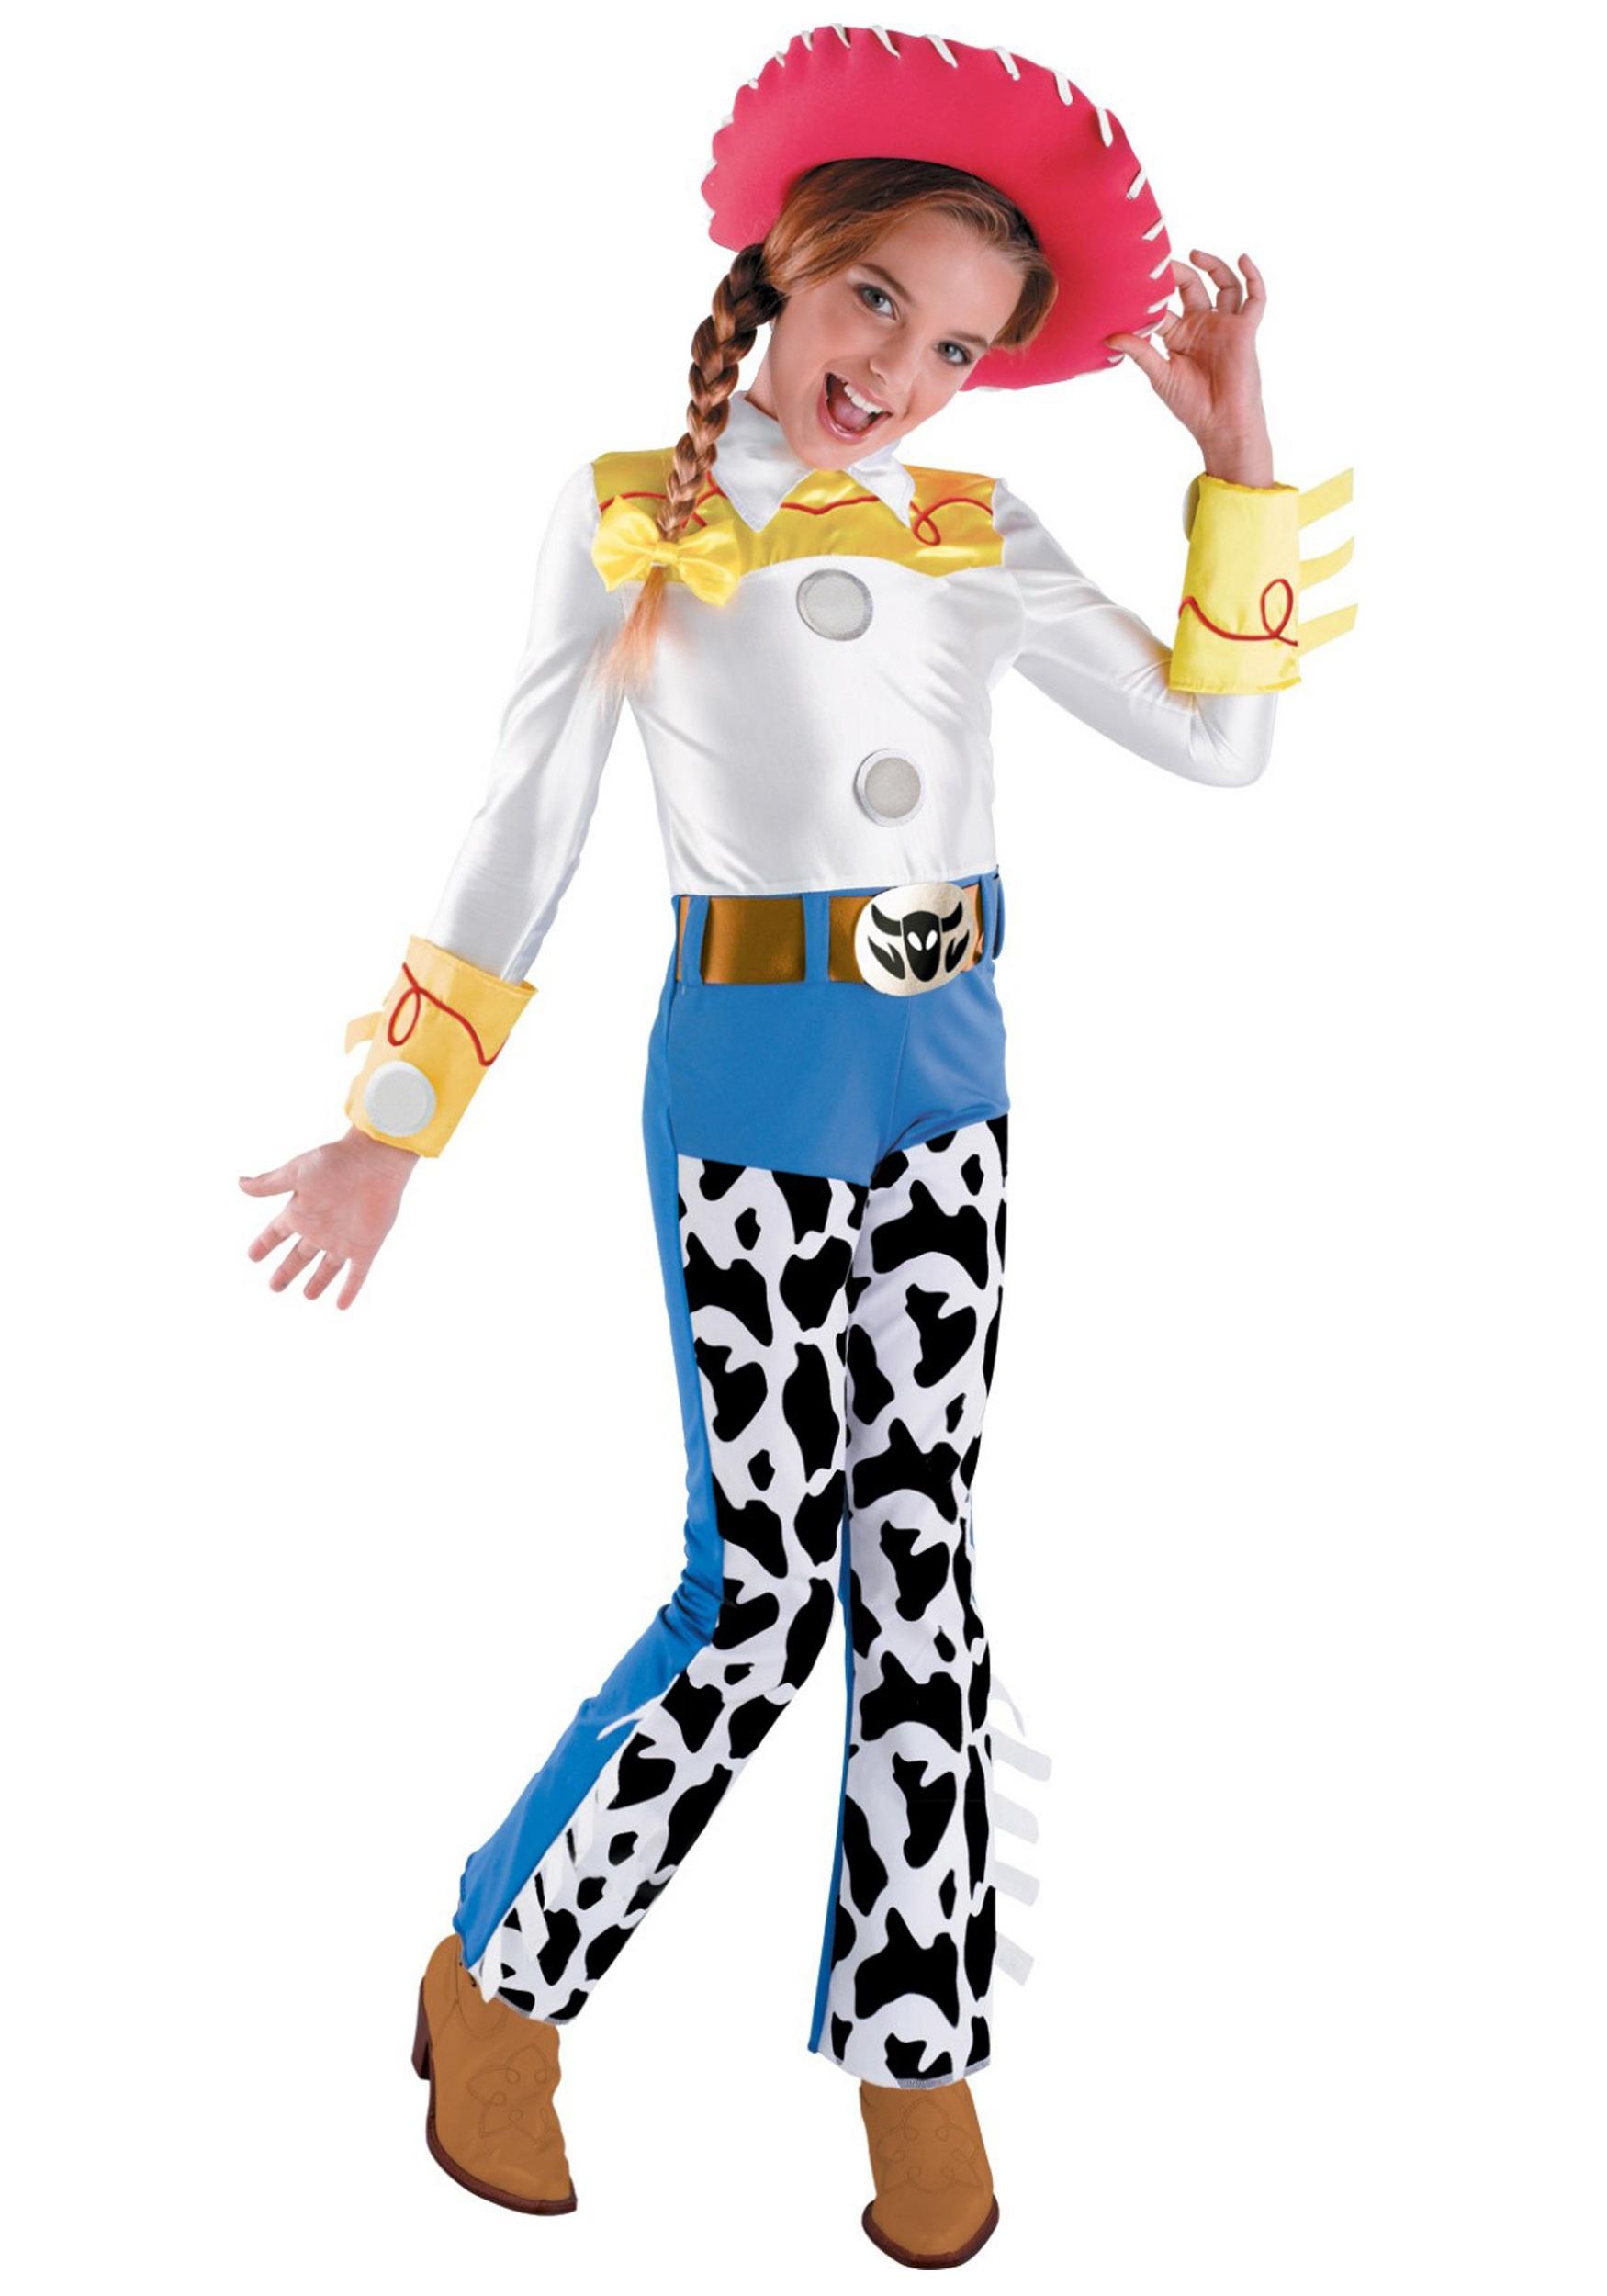 Toy Story Jessie Costume Pattern   Homemade Jesse U0026 Slinky Dog ... 30b924517ad